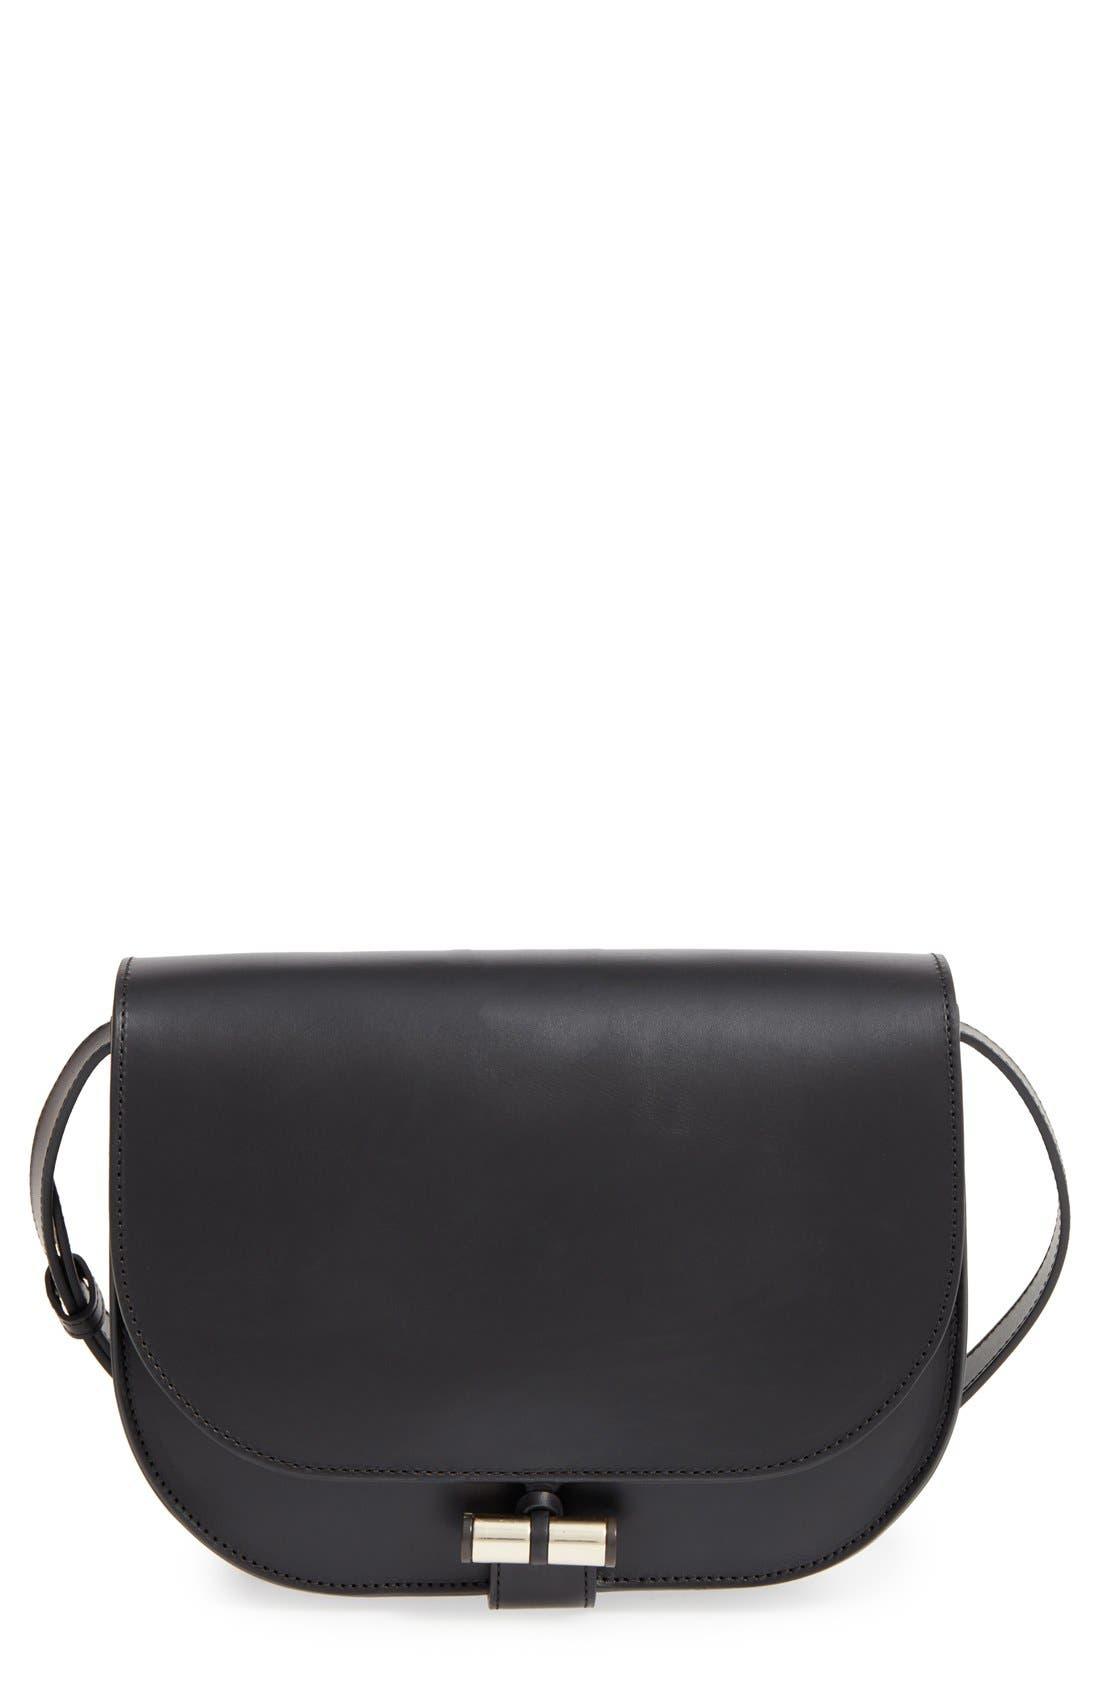 'Sac June' Leather Shoulder Bag,                             Main thumbnail 1, color,                             001